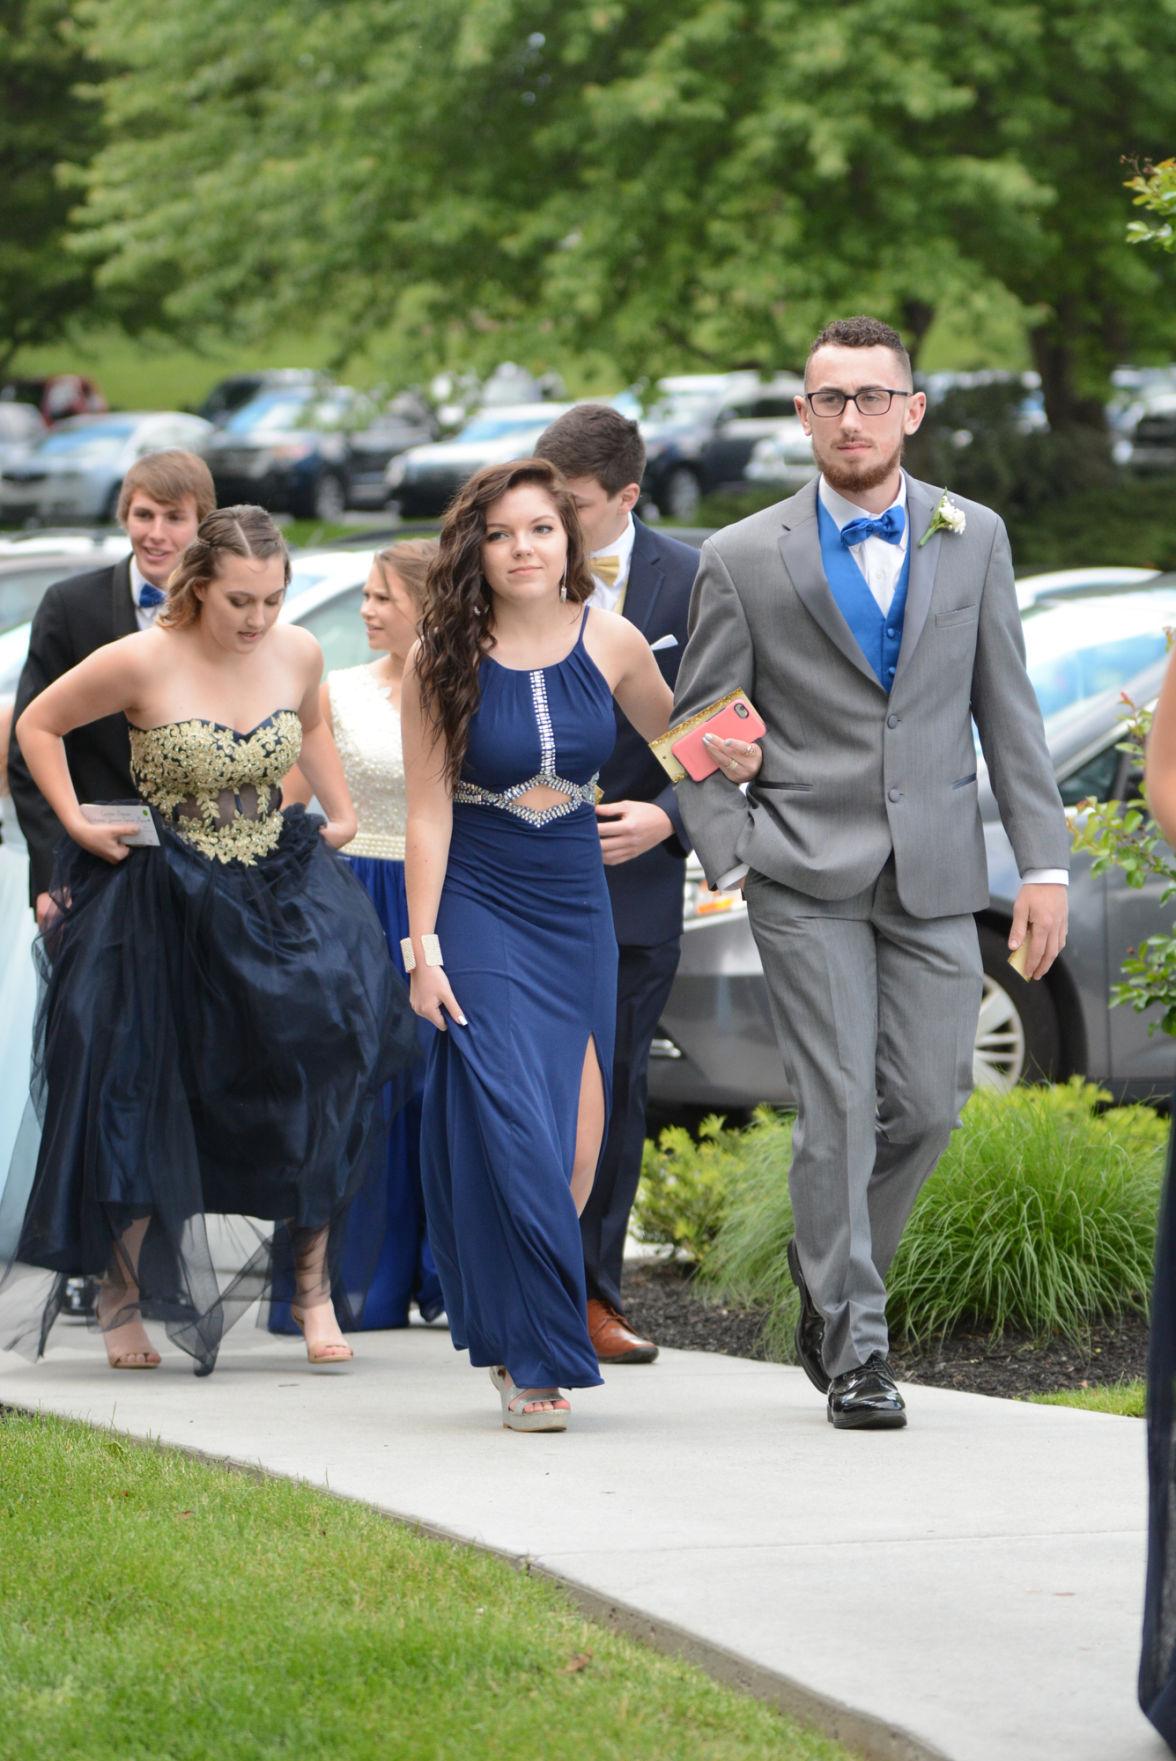 Octorara High School prom 2017